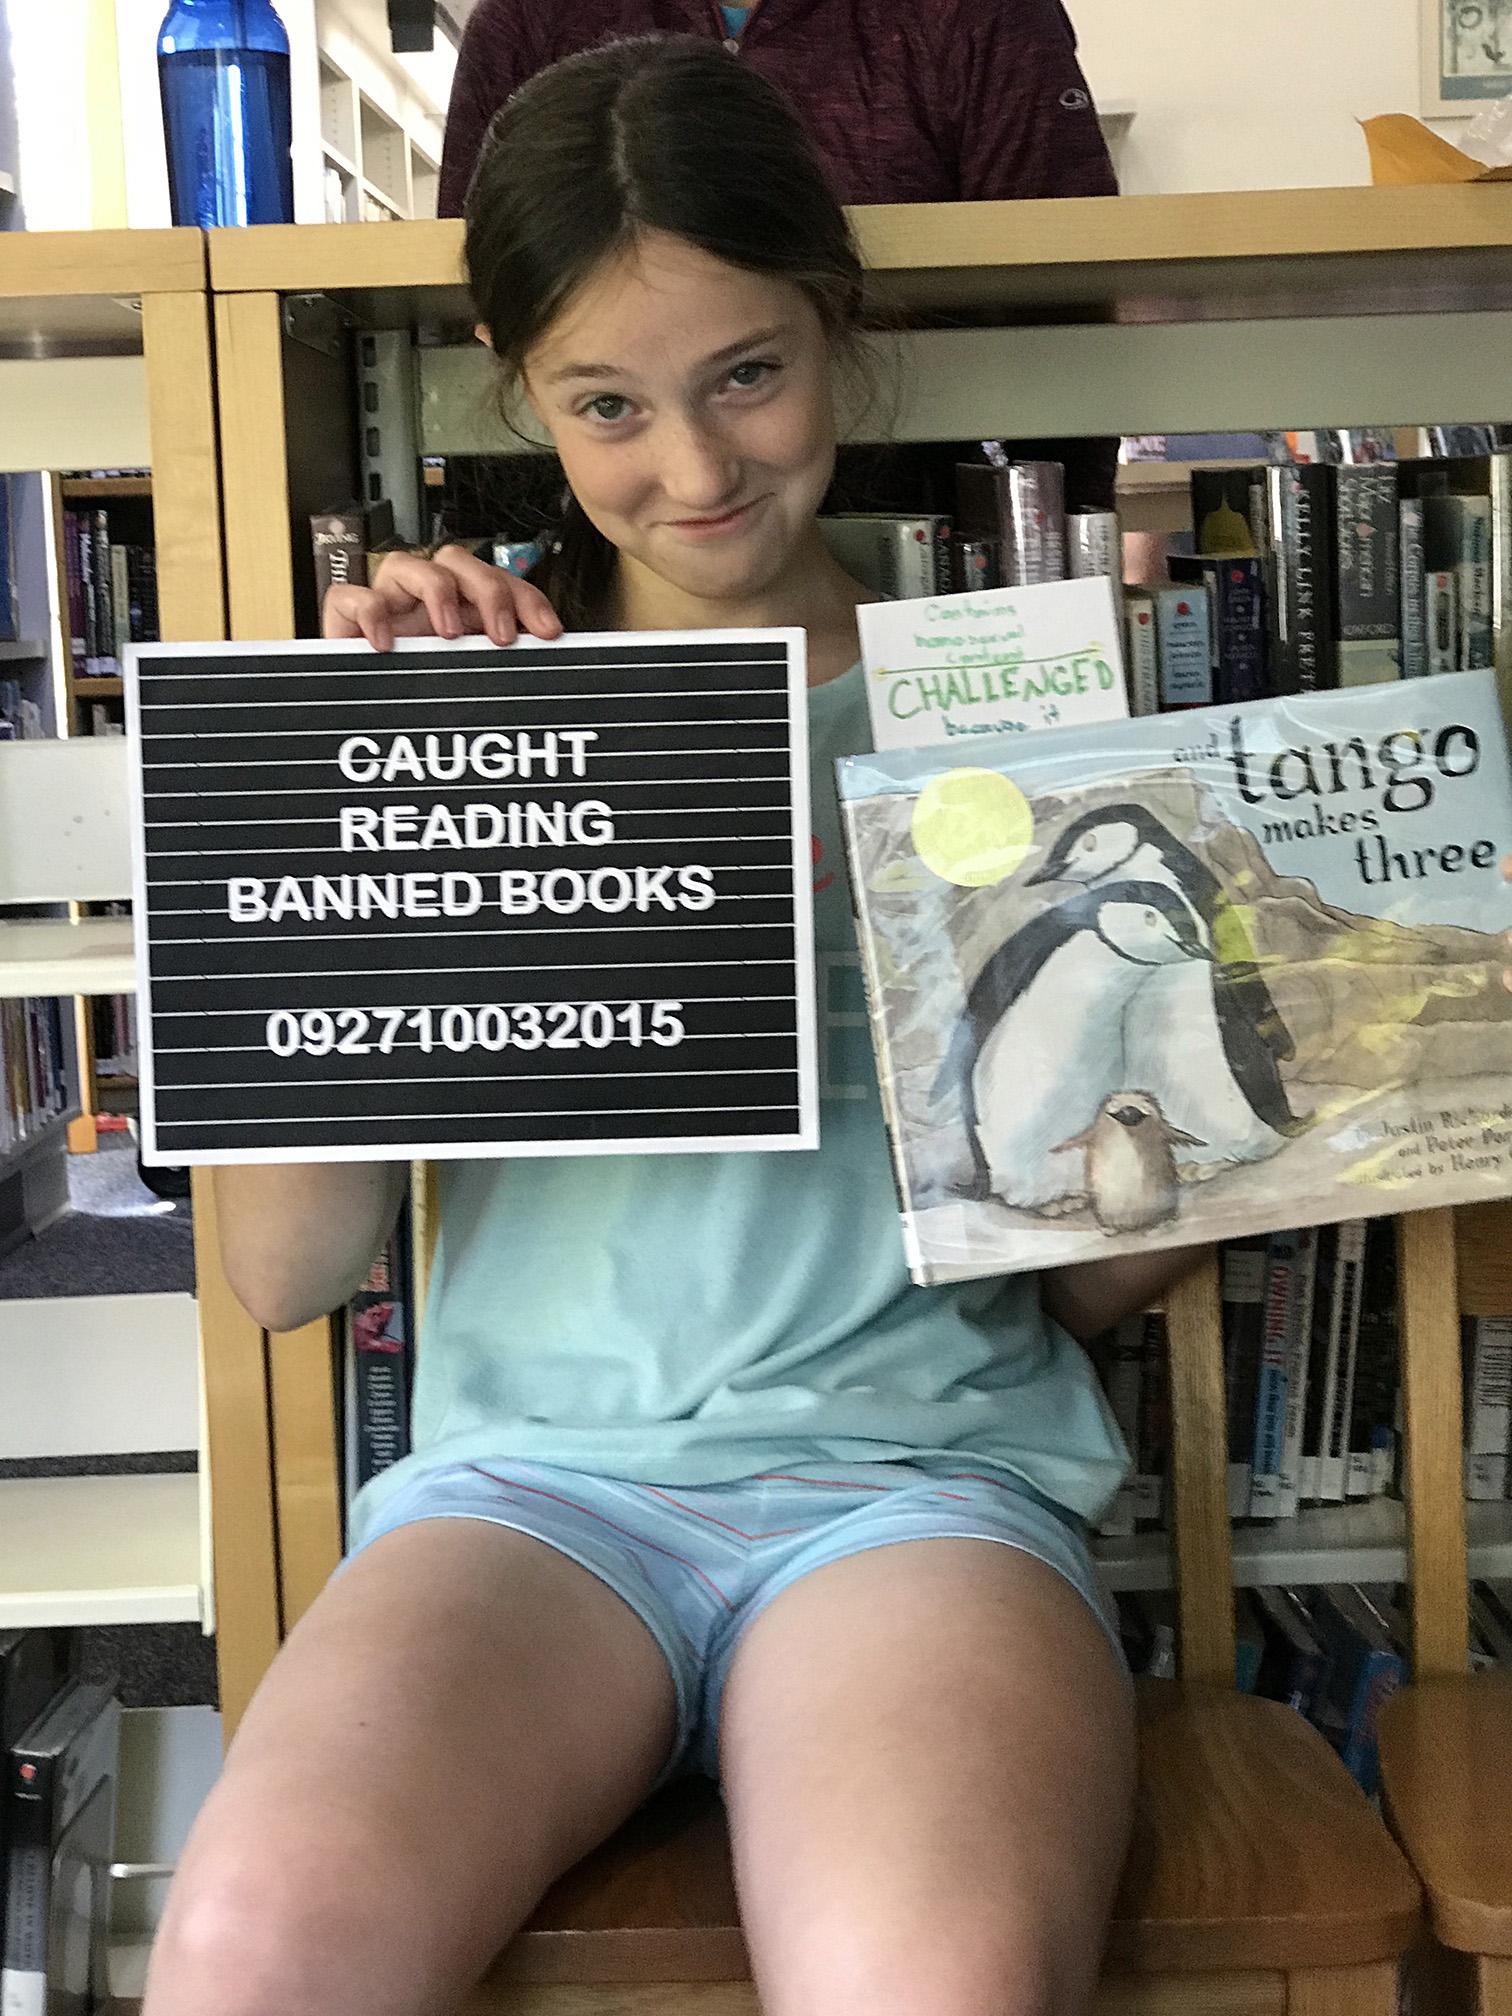 Sofia reading And Tango Makes Three